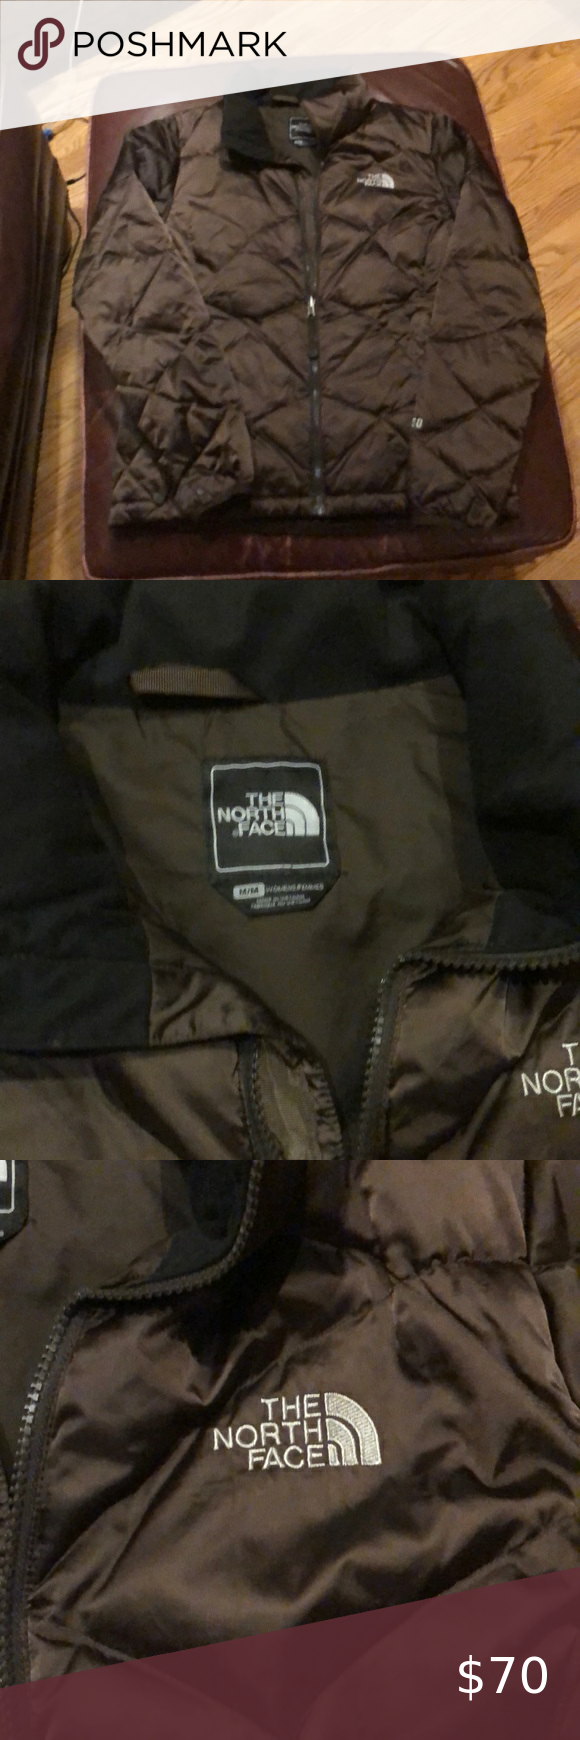 Brown Northface Puffer Jacket Medium Womans Tnf The North Face Jackets Coats Puffers North Face Puffer Jacket The North Face North Face Jacket [ 1740 x 580 Pixel ]